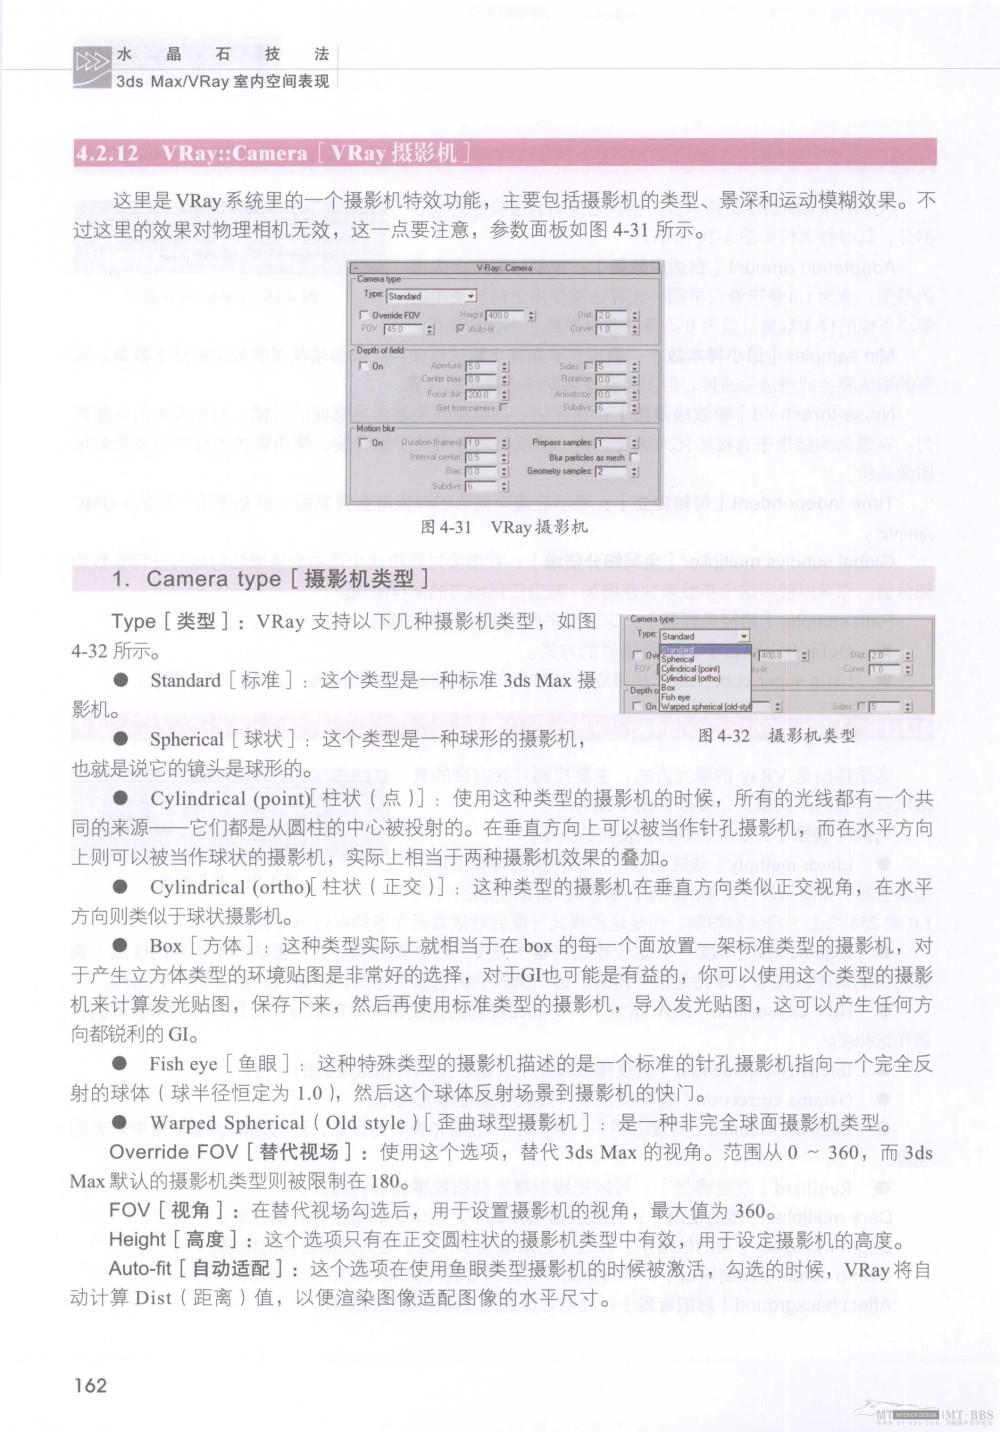 水晶石技法-3ds_Max&VRay室内空间表现_水晶石技法-3ds_Max&VRay室内空间表现_页面_168.jpg